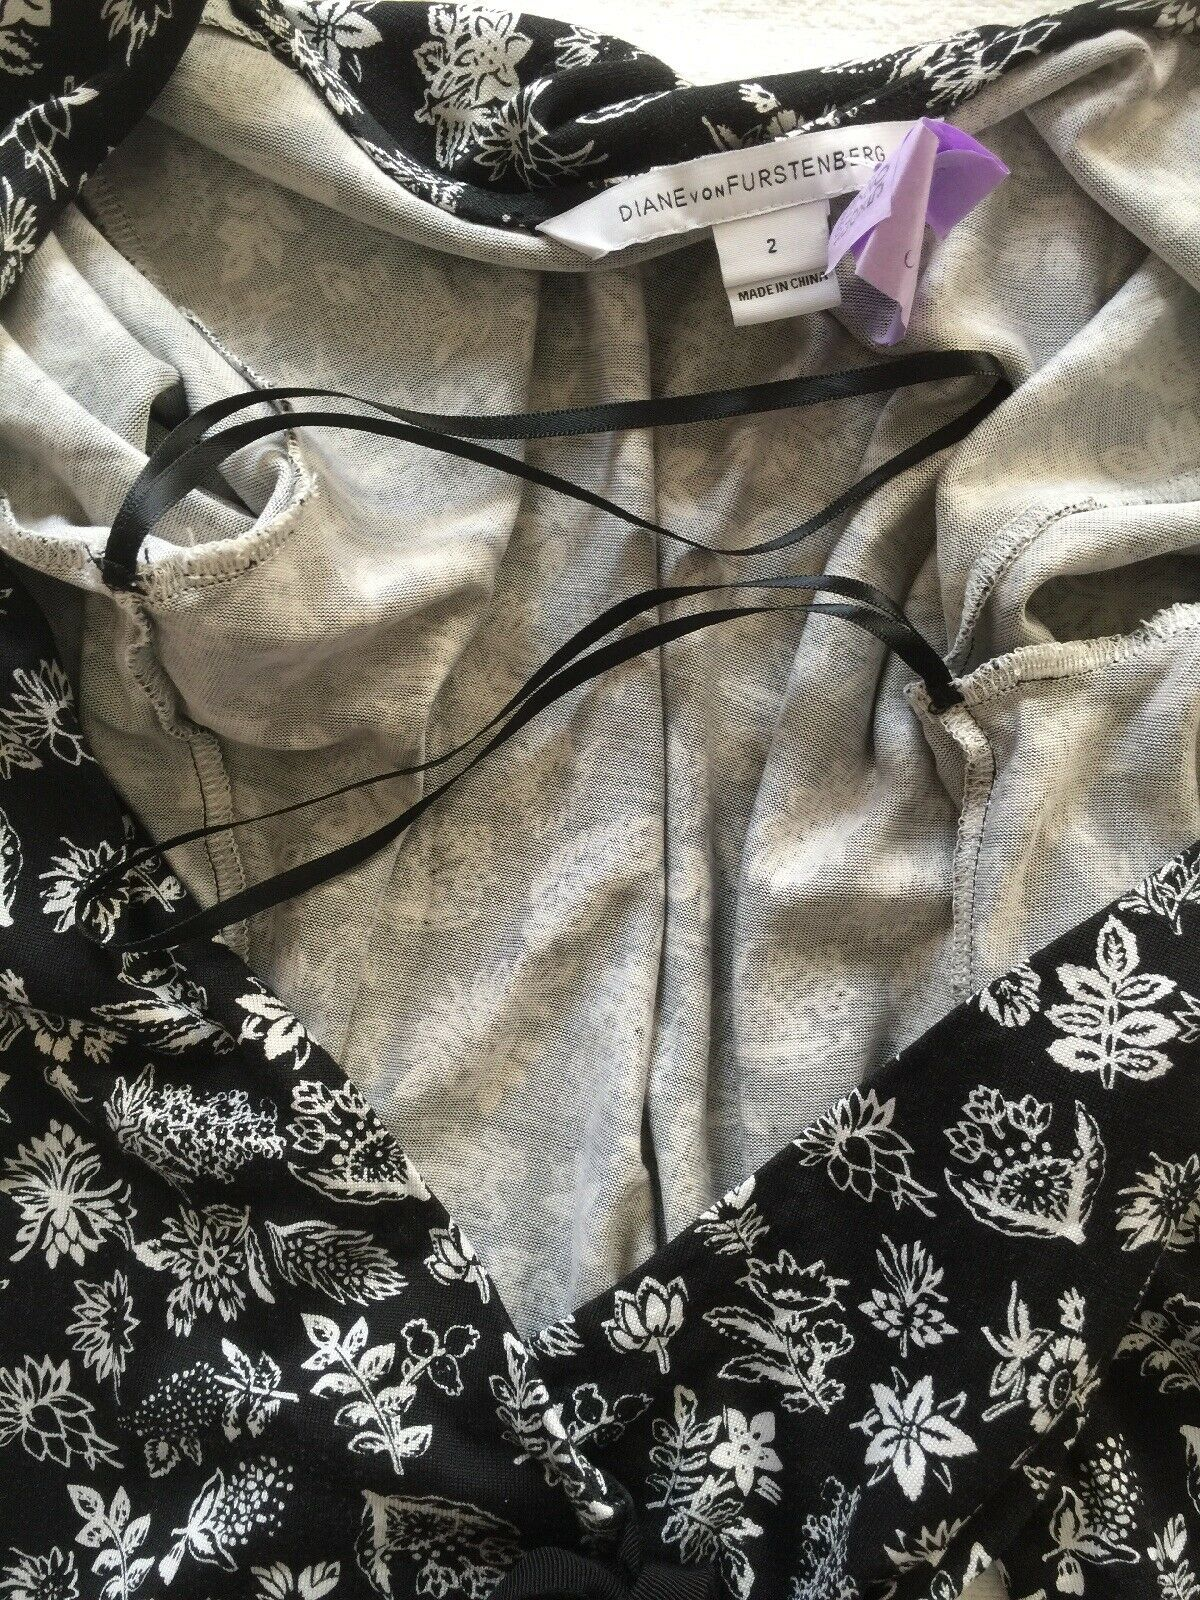 Dvf Dress - image 11